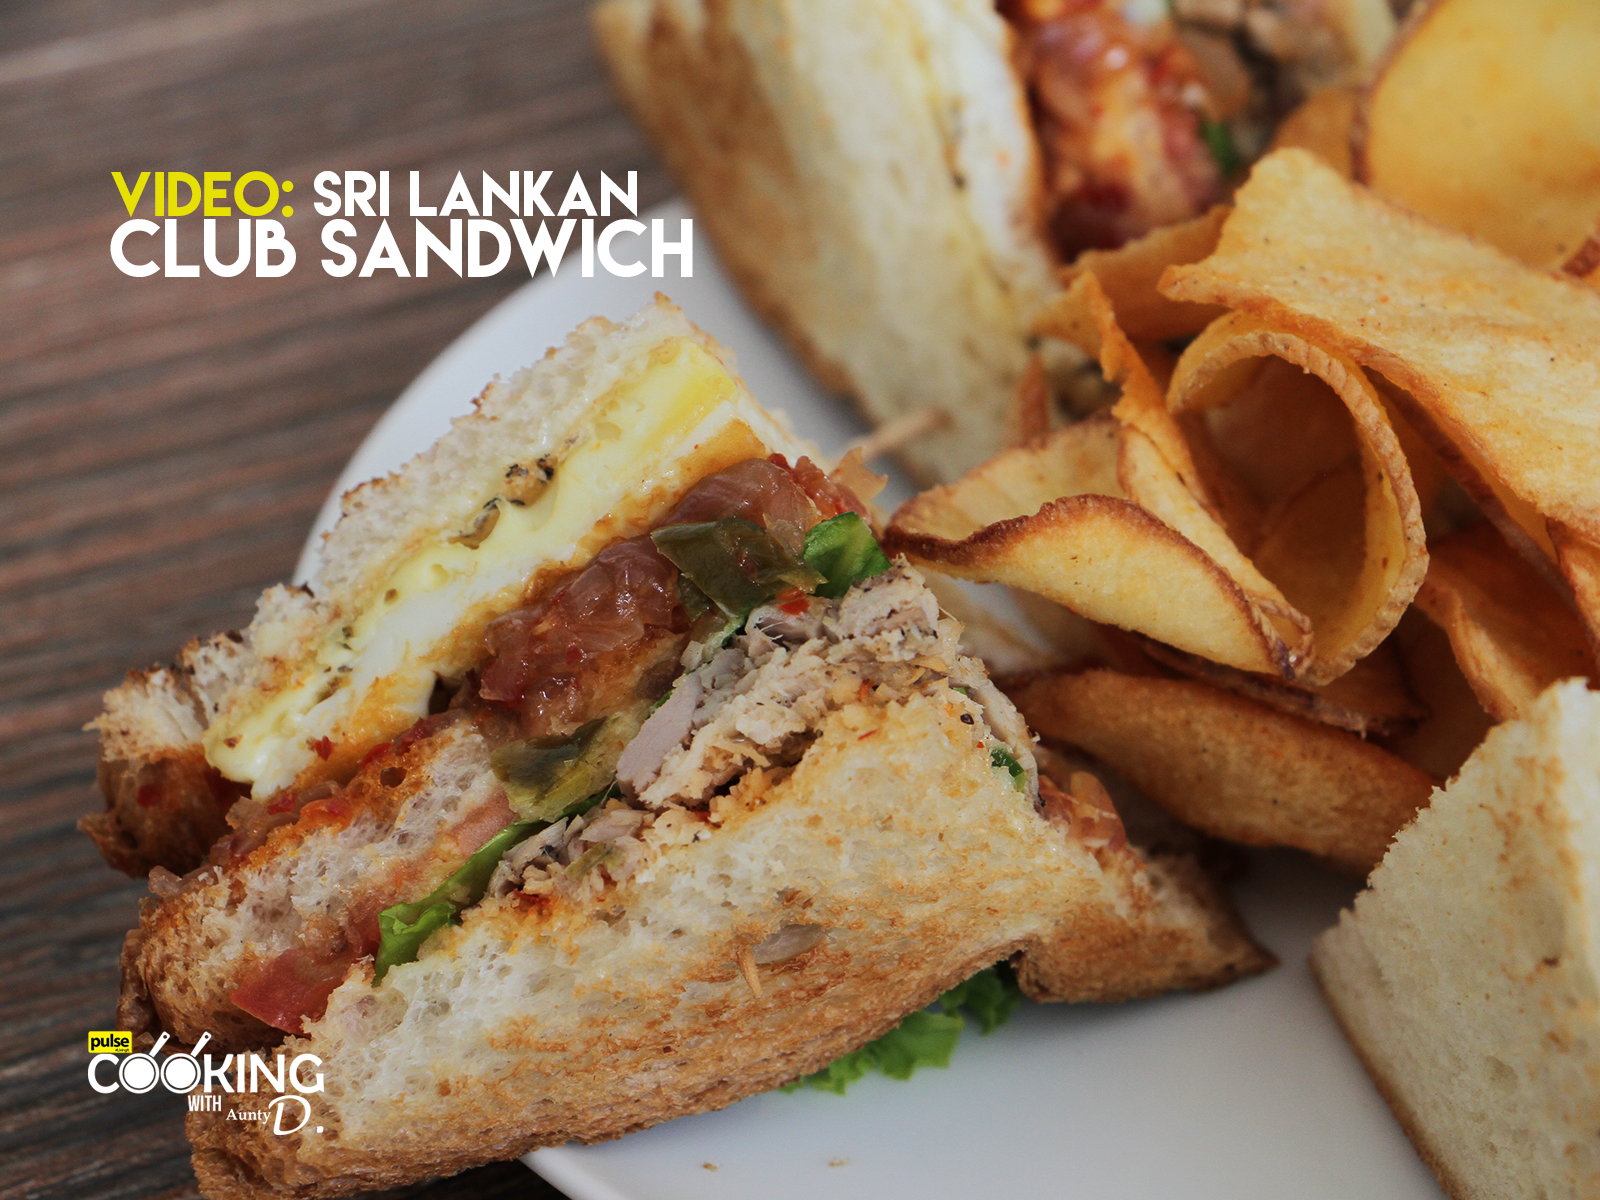 Sri lankan sandwich pulse sri lankan sandwich forumfinder Image collections